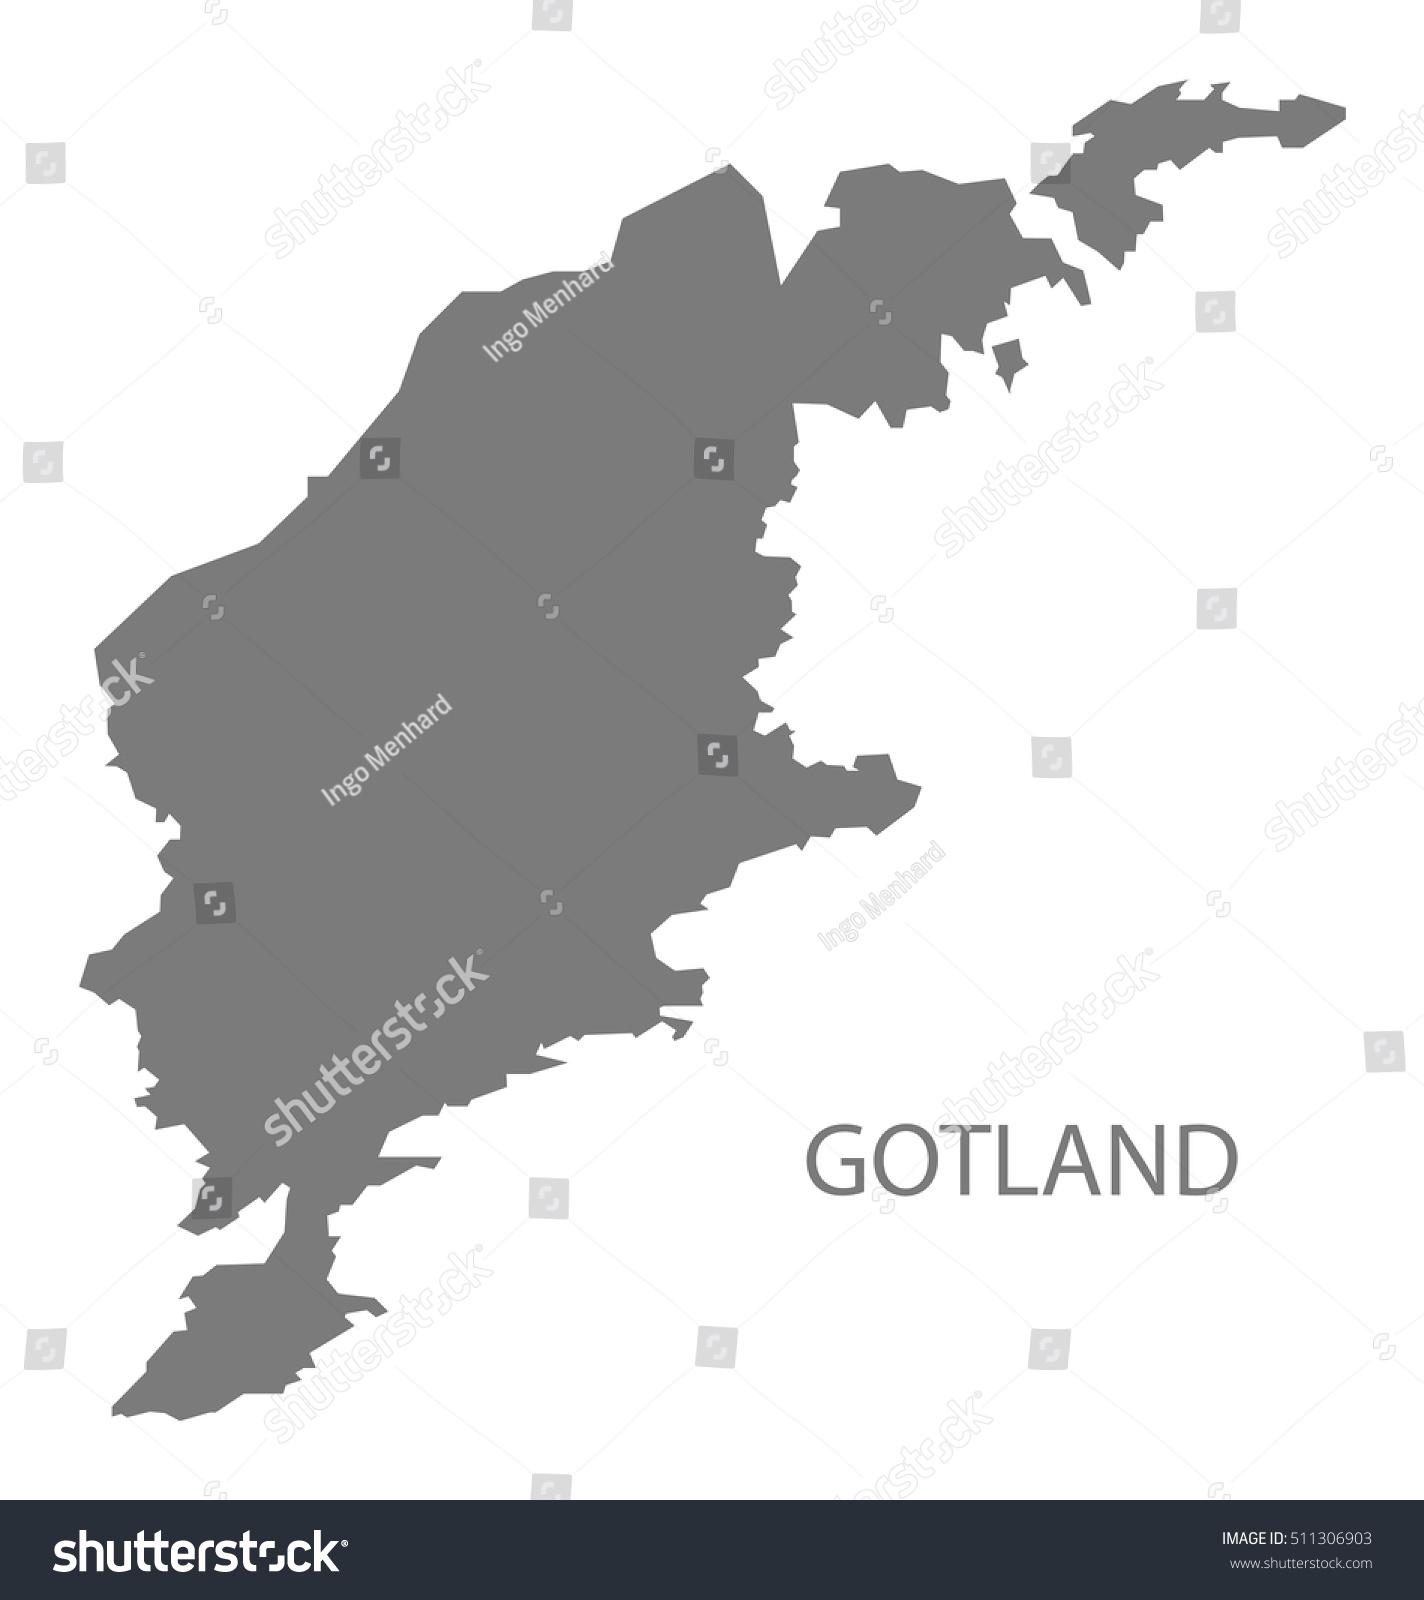 Gotland Sweden Map Grey Stock Vector Shutterstock - Sweden map gotland